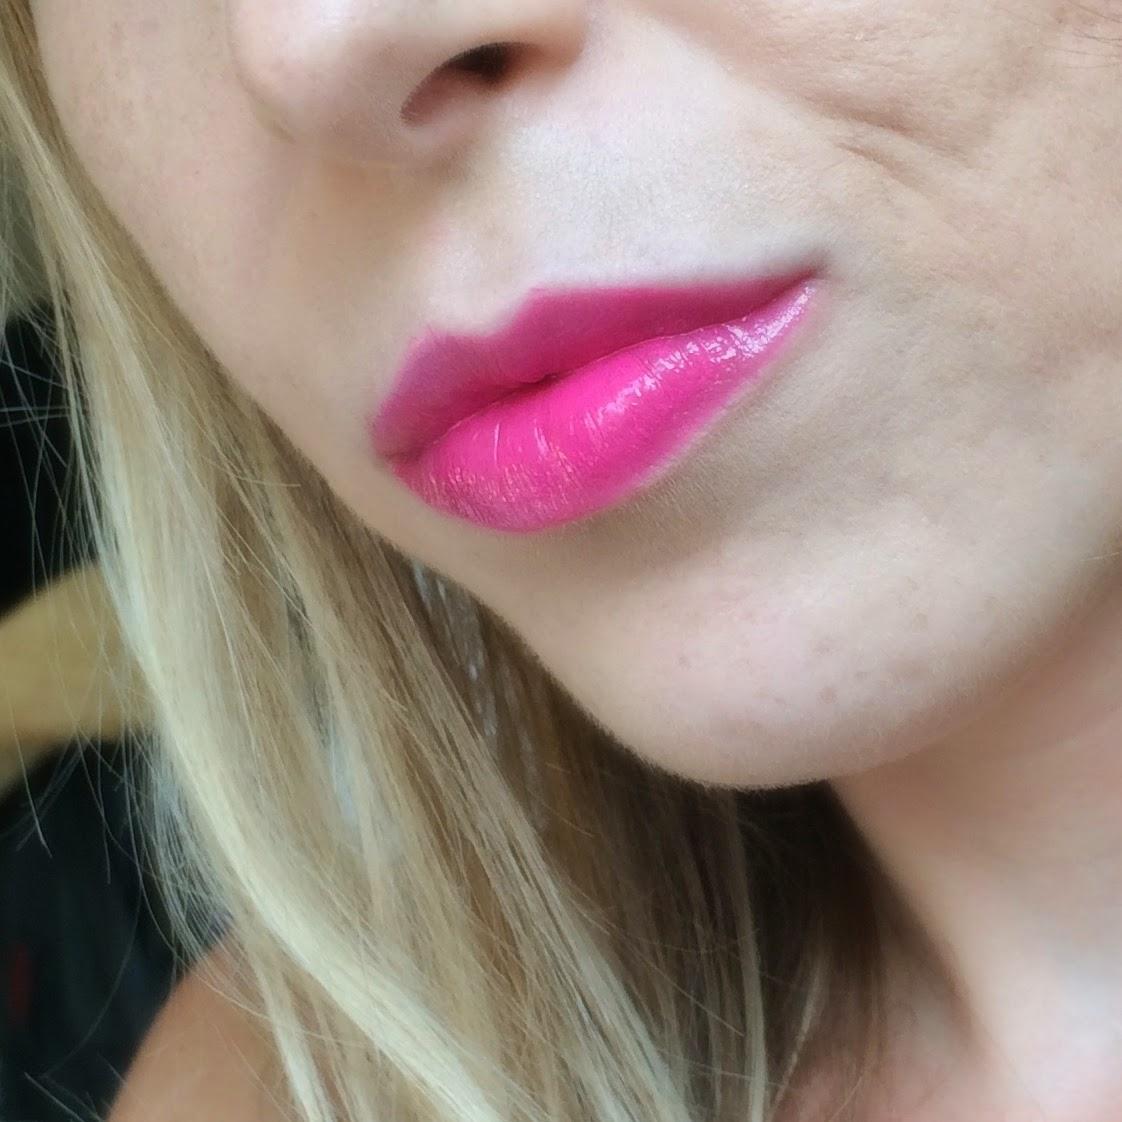 Revlon-colorstay-moisture-stain-rio-rush-on-lips